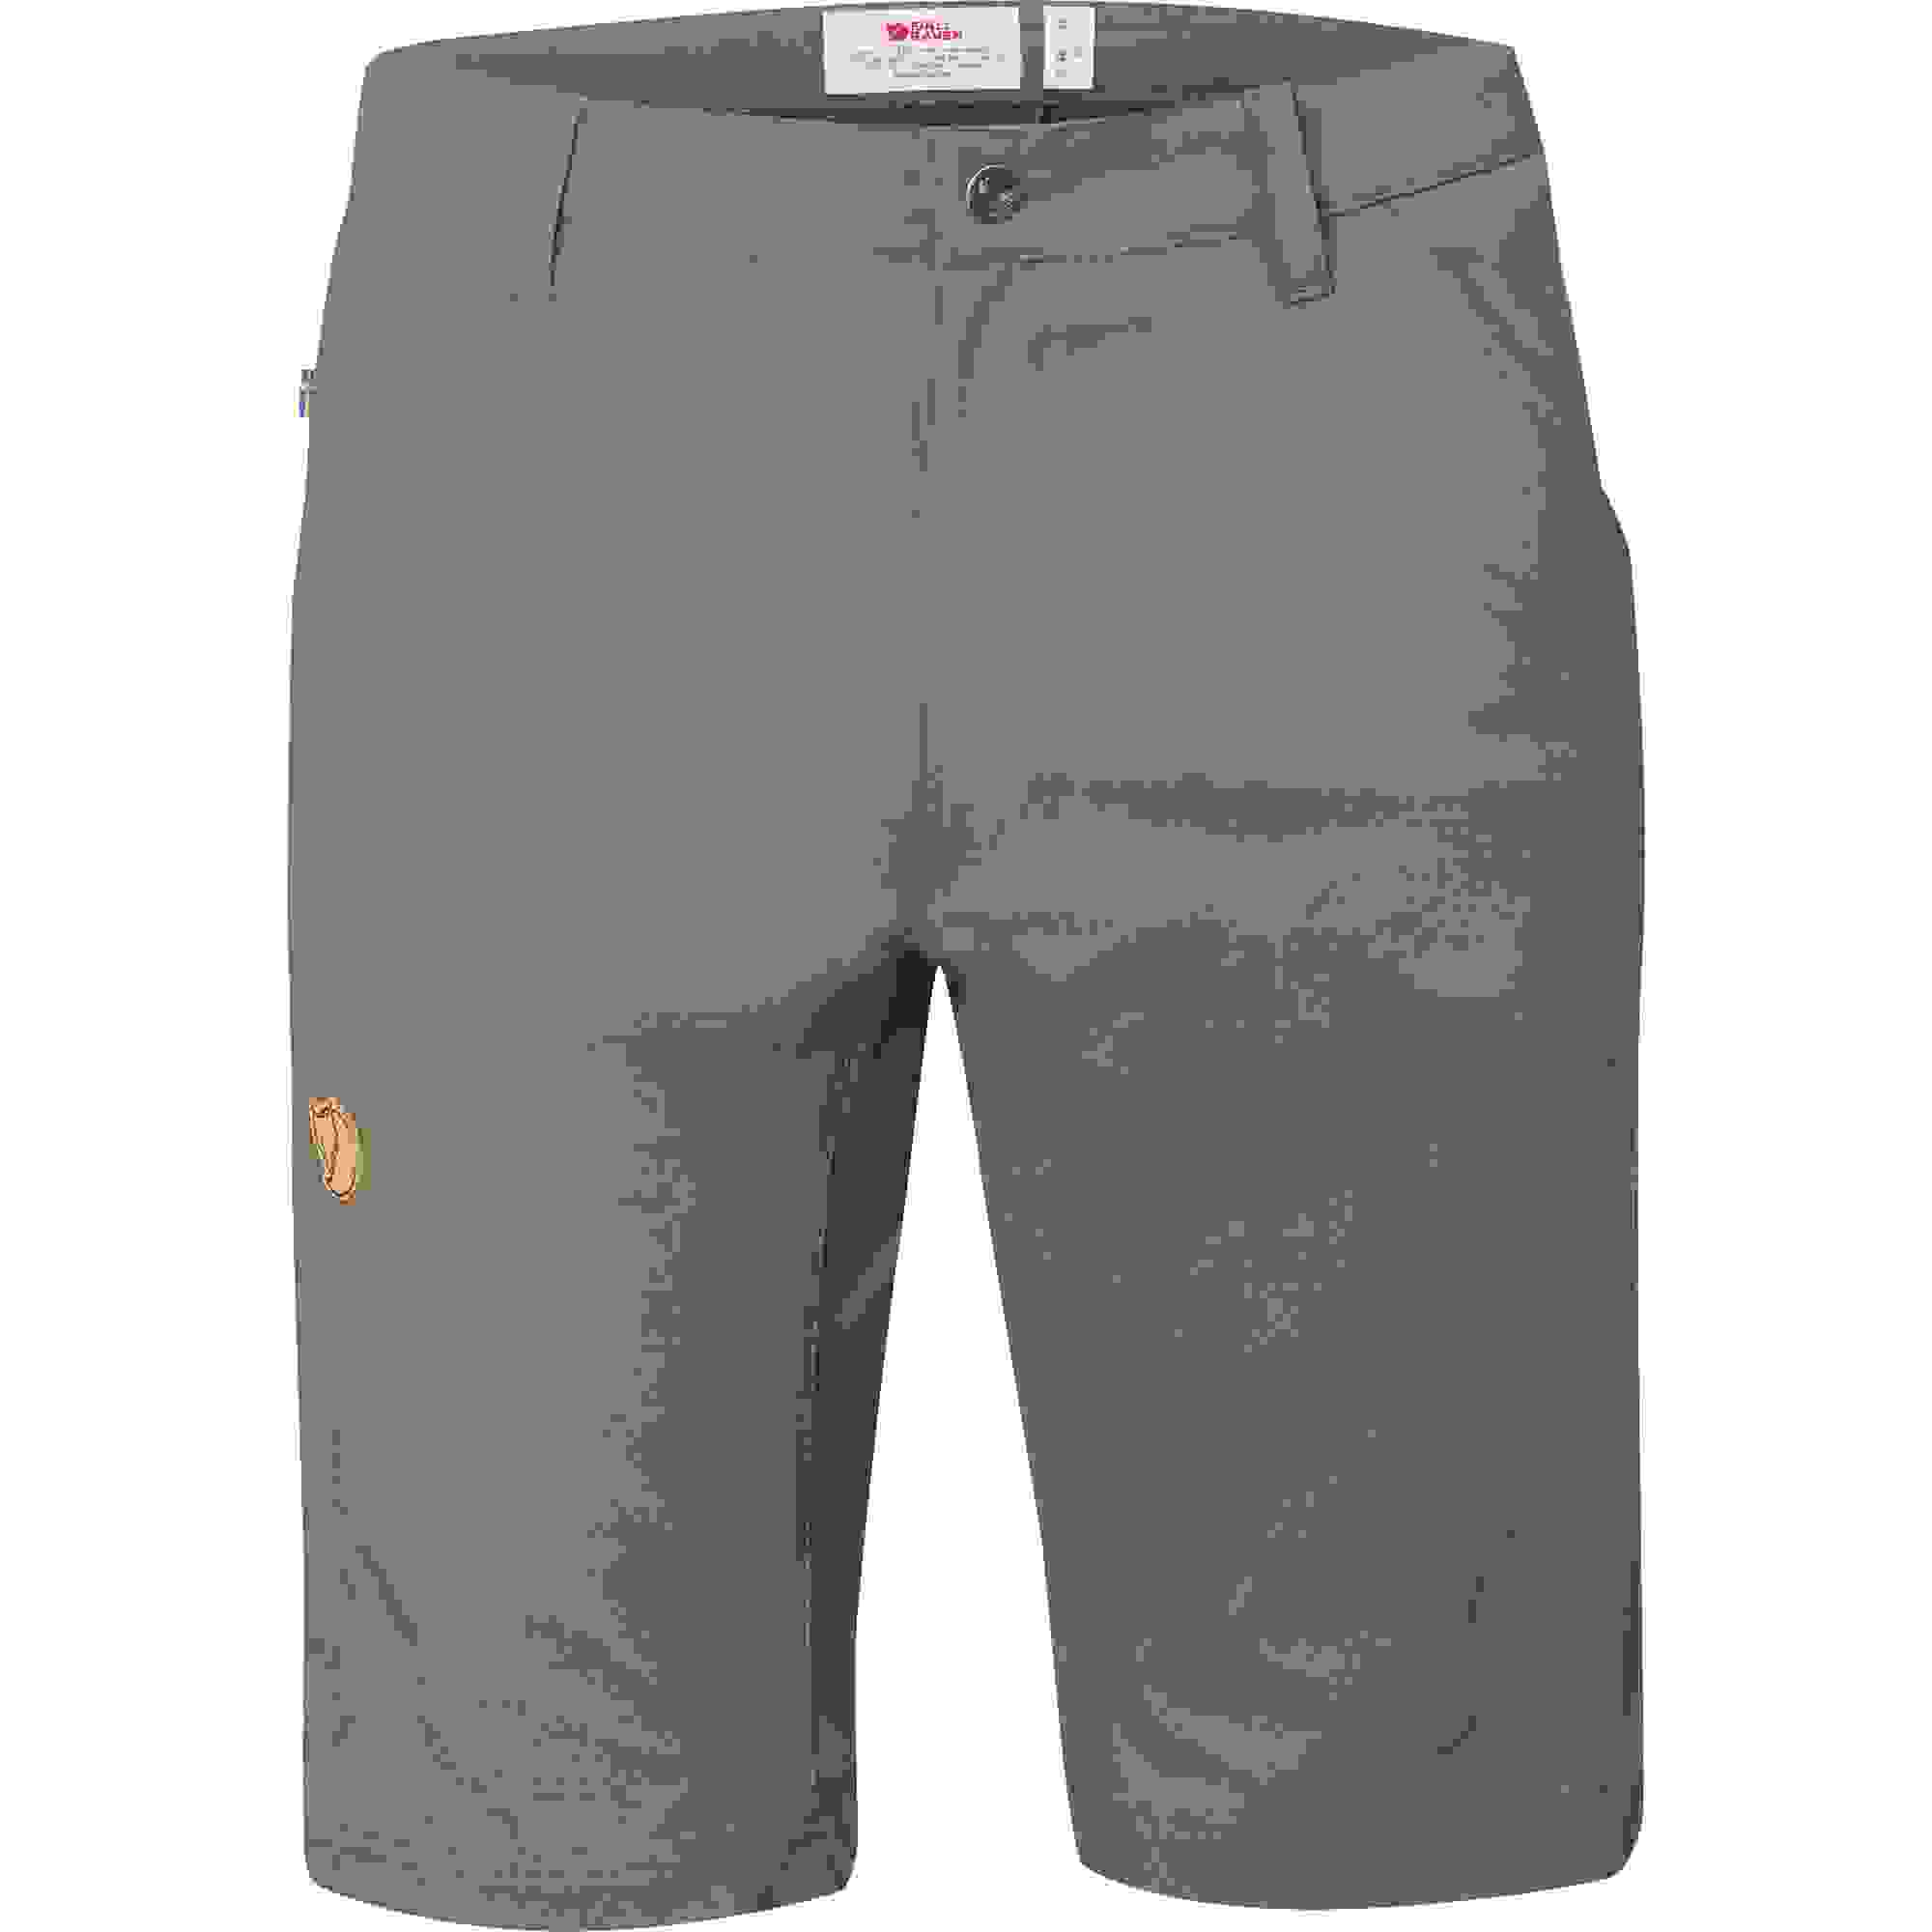 FJ/ÄLLR/ÄVEN Pantalones Cortos para Hombre Abisko